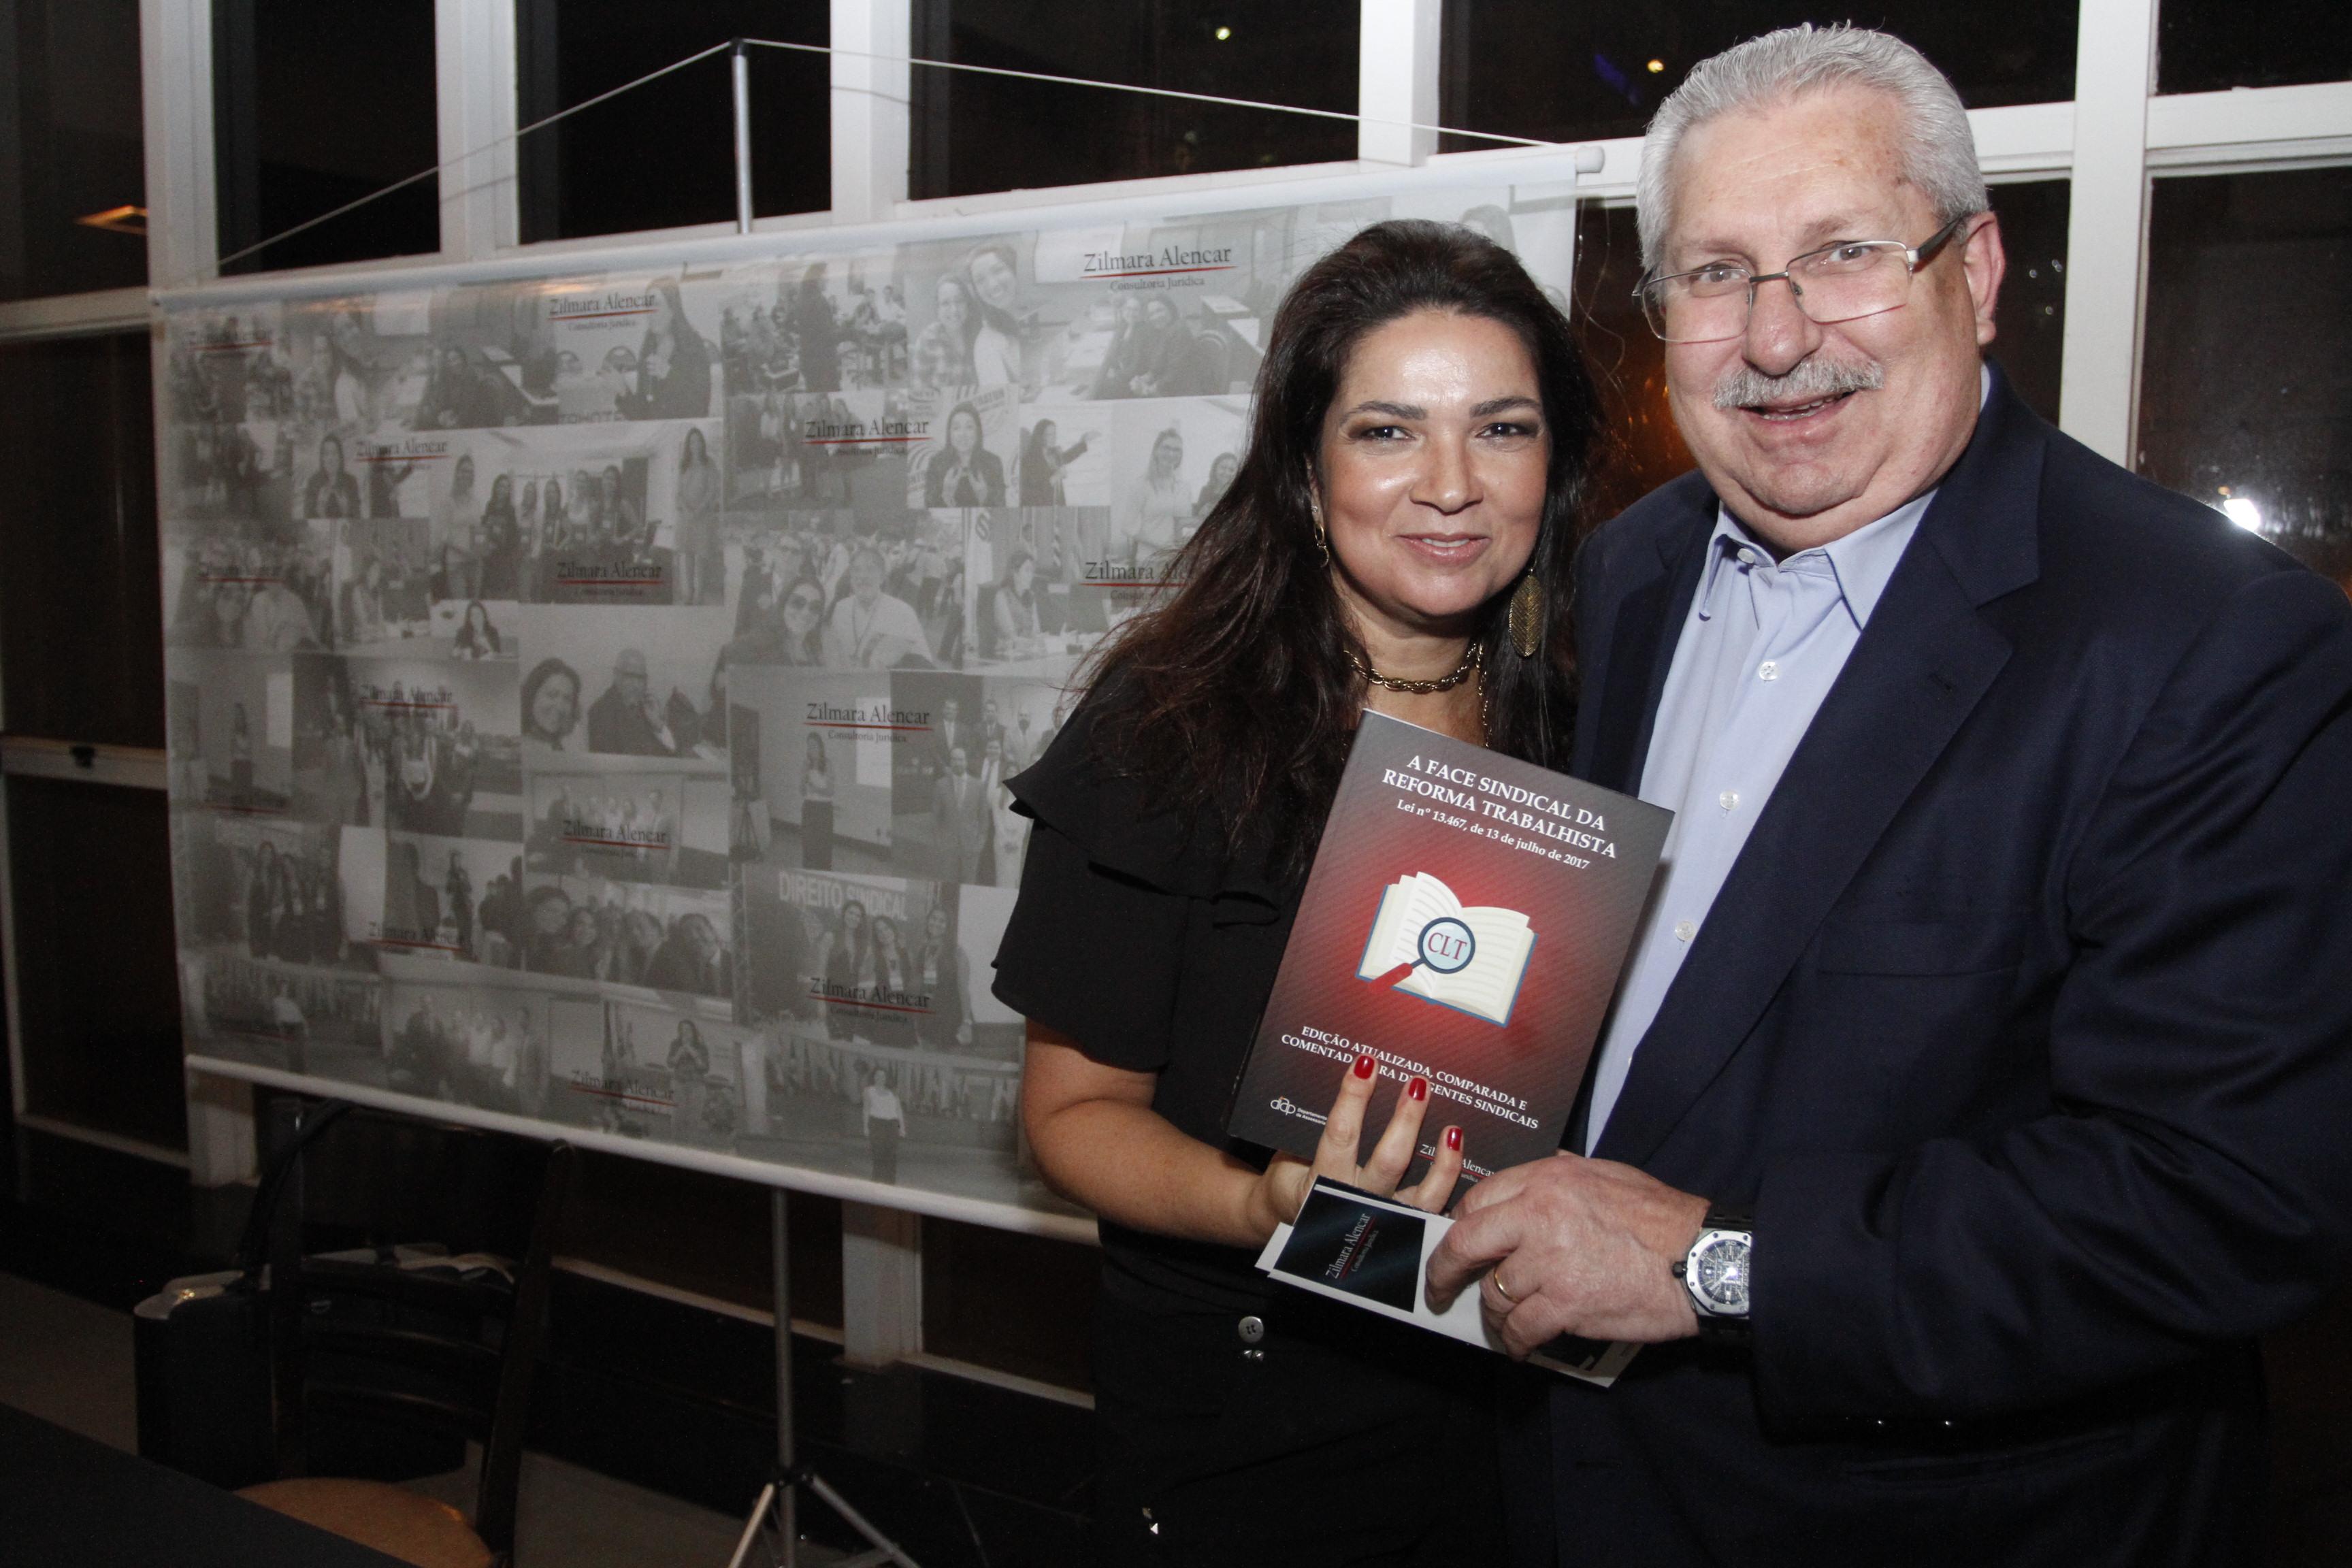 Consultora Zilmara Alencar lança livro que analisa reforma trabalhista